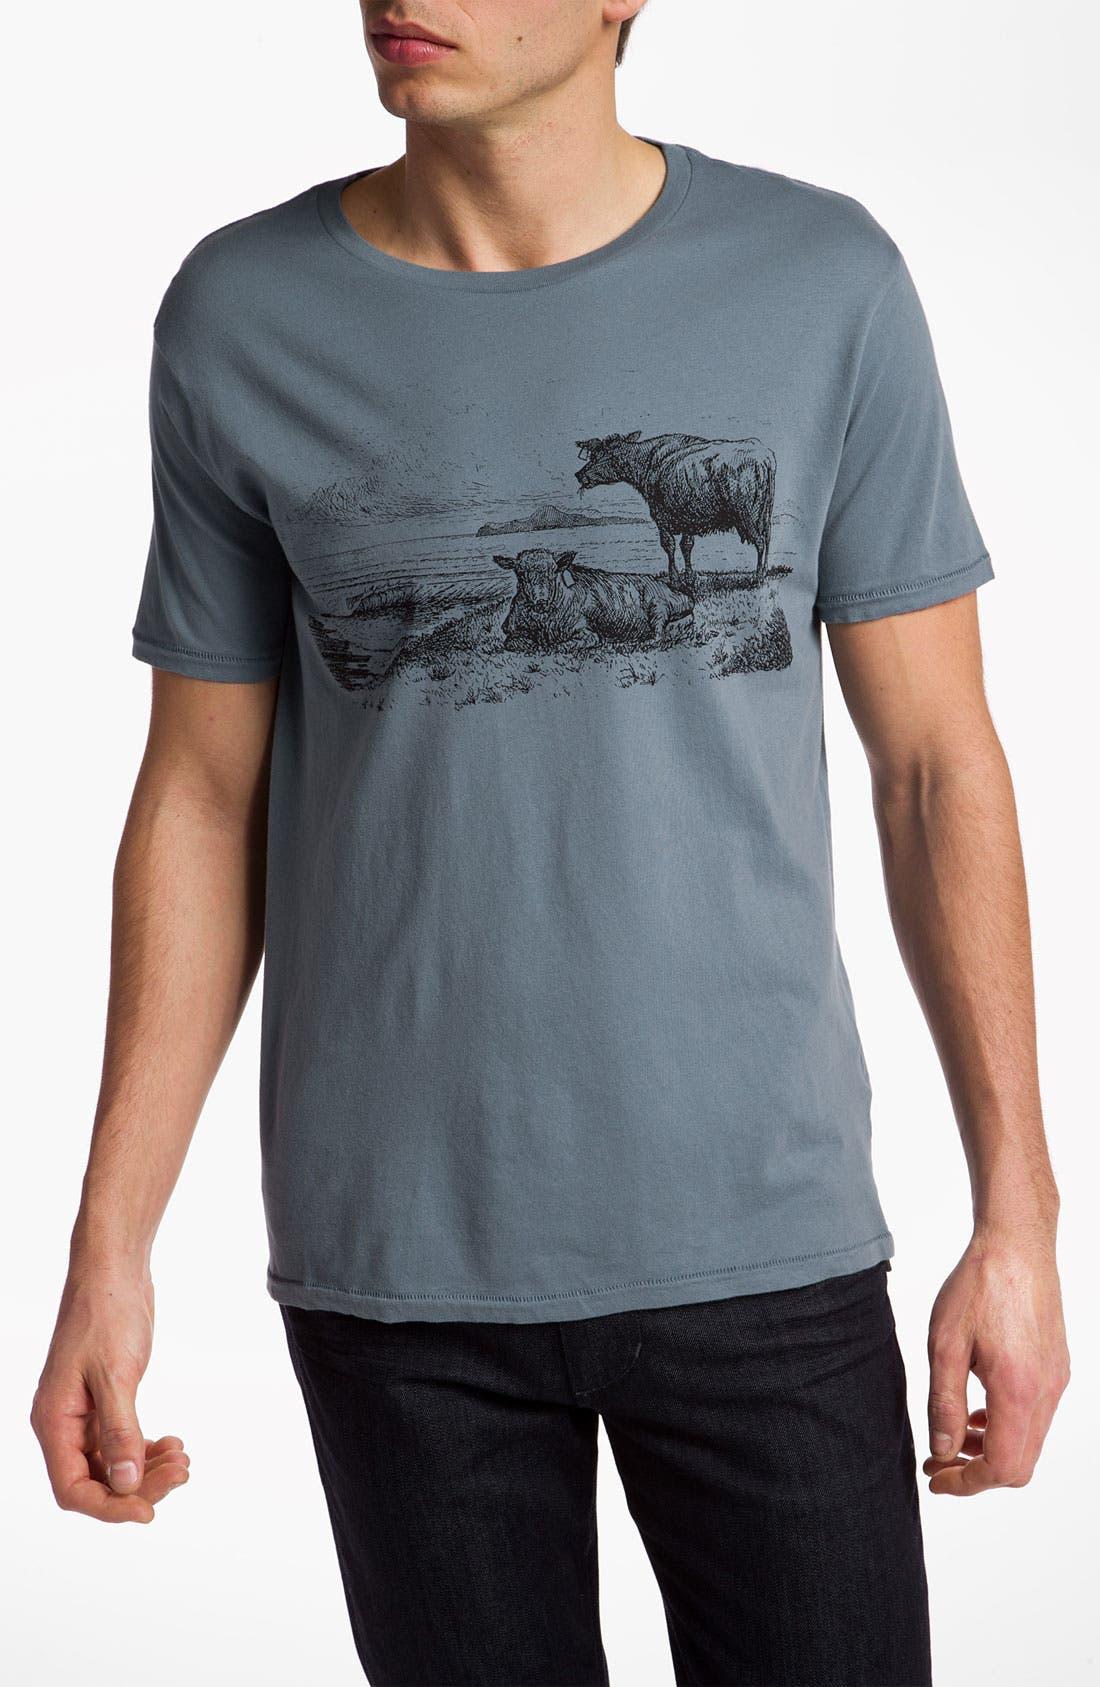 Main Image - VSTR 'Old Bull' Graphic T-Shirt